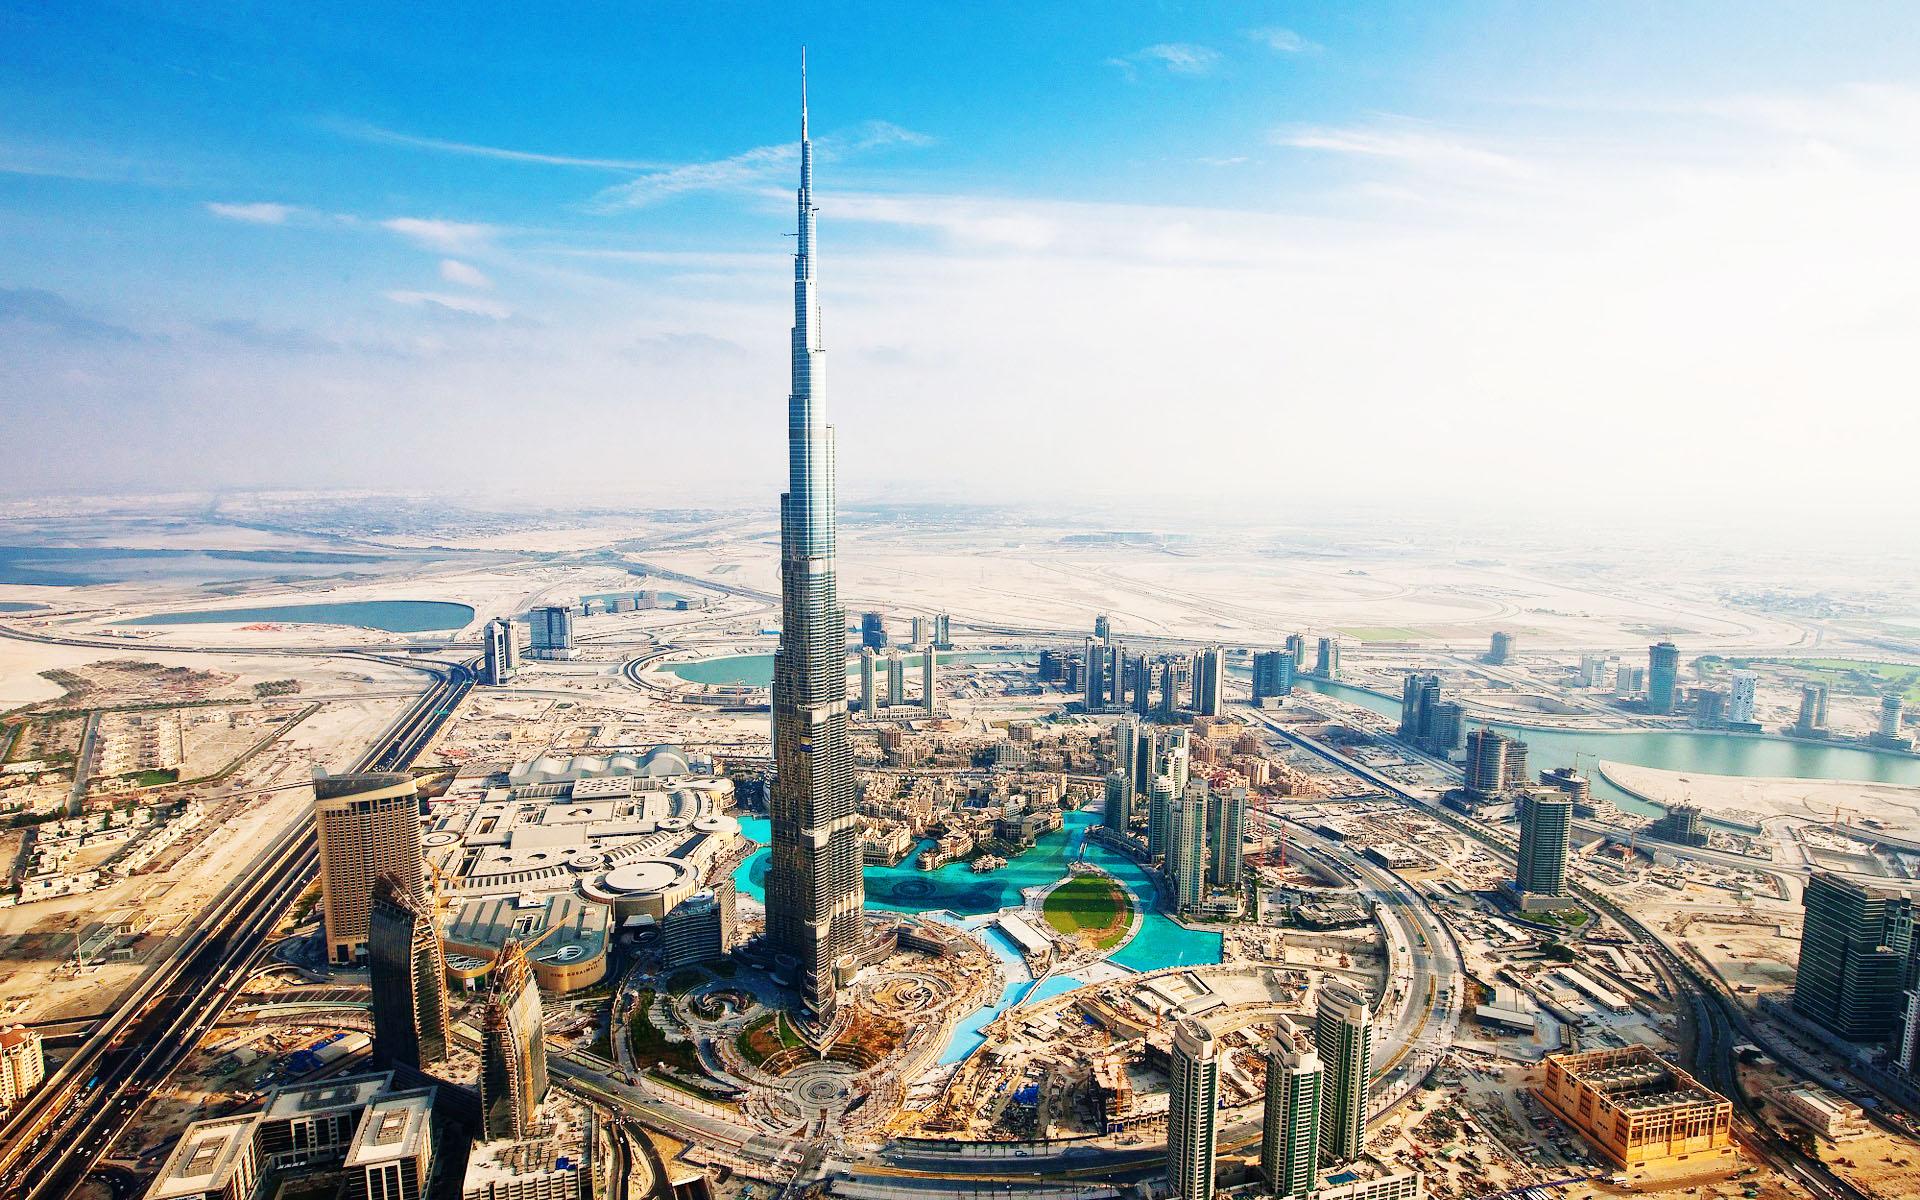 Dubai with the iconic Burj Khalifa